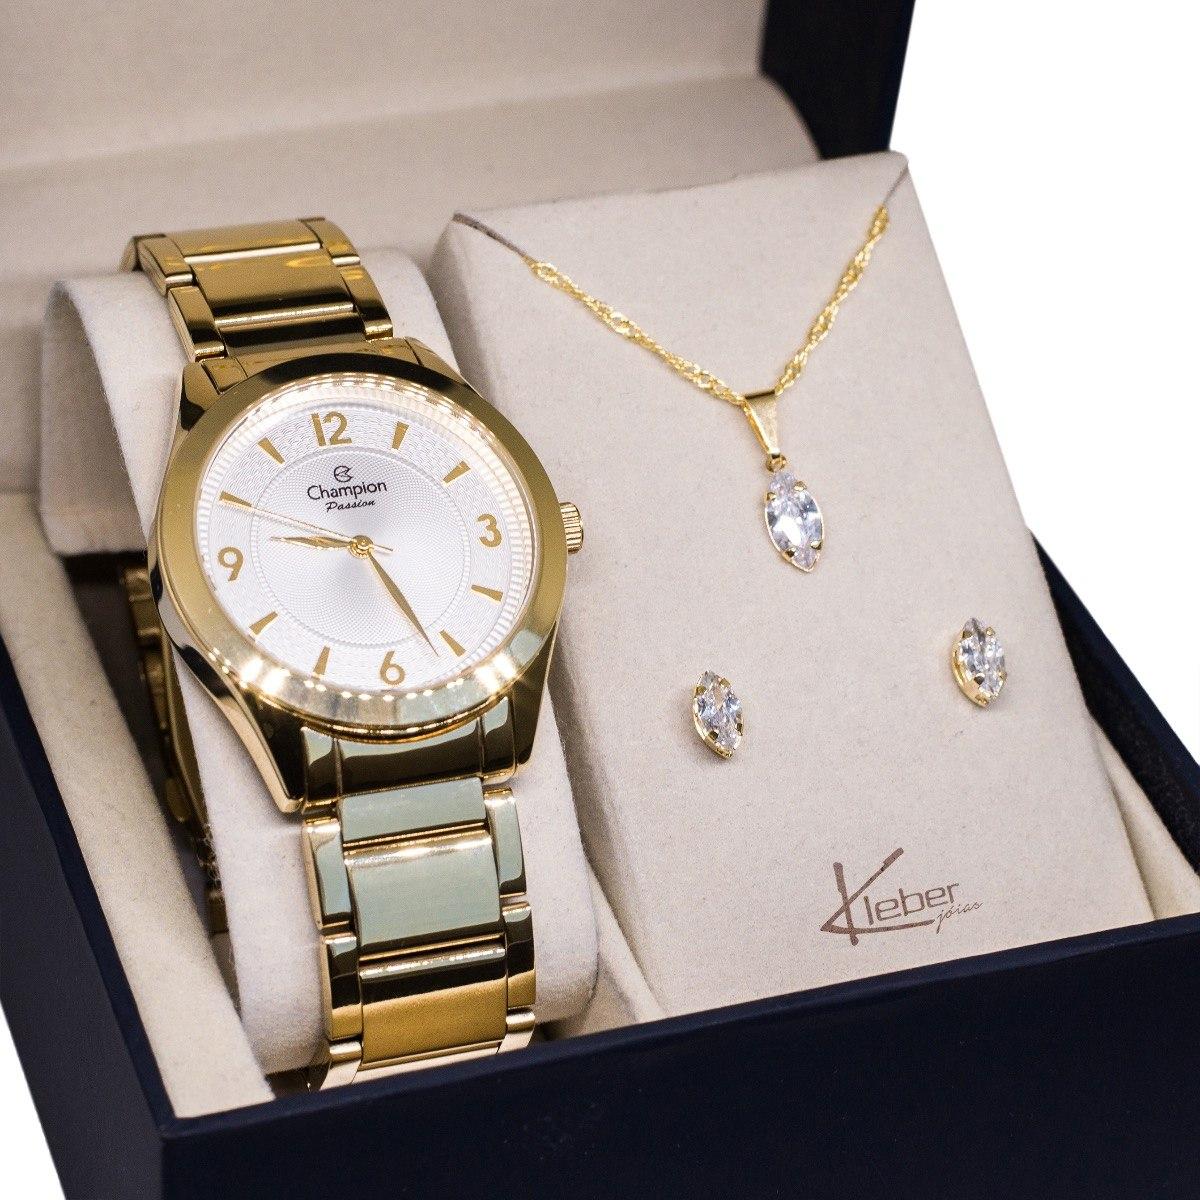 26b20591977 relógio champion feminino dourado cn28866h kit colar brincos. Carregando  zoom.